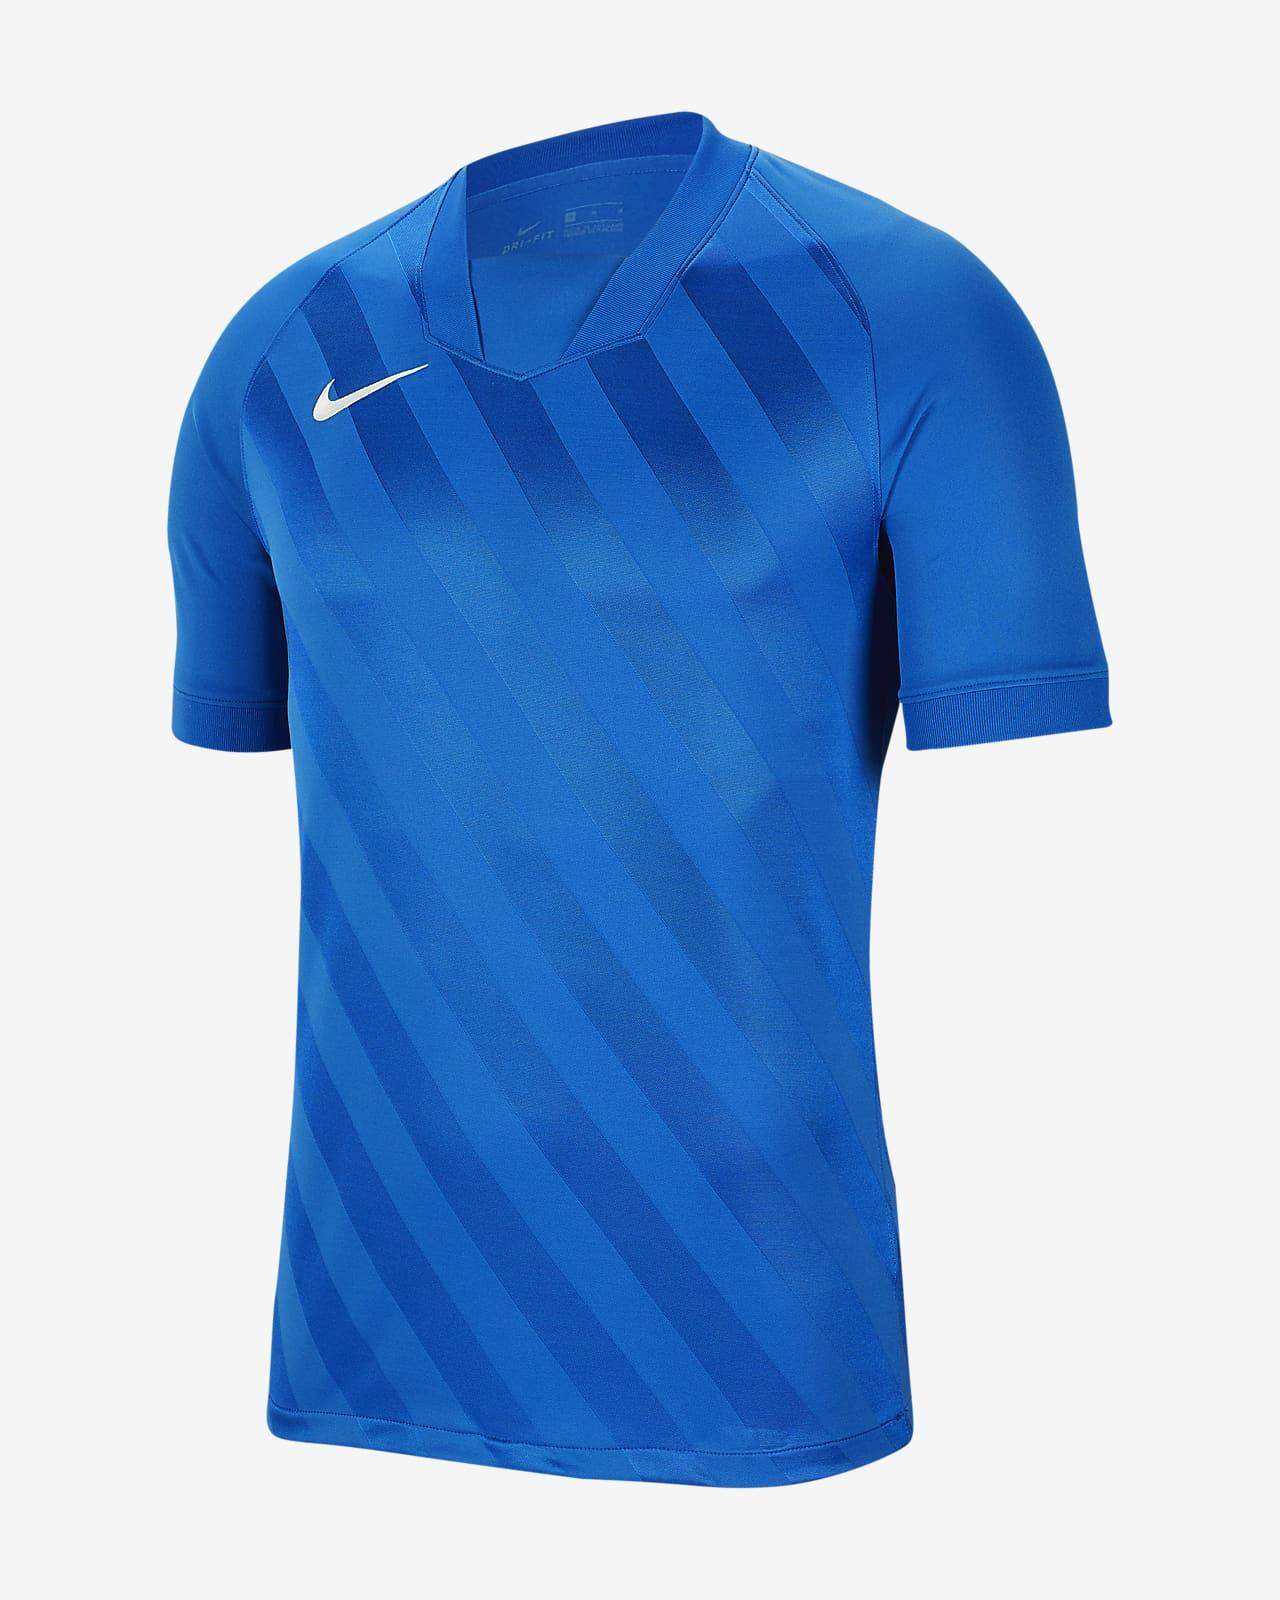 Pánský fotbalový dres Nike Dri-FIT Challenge 3